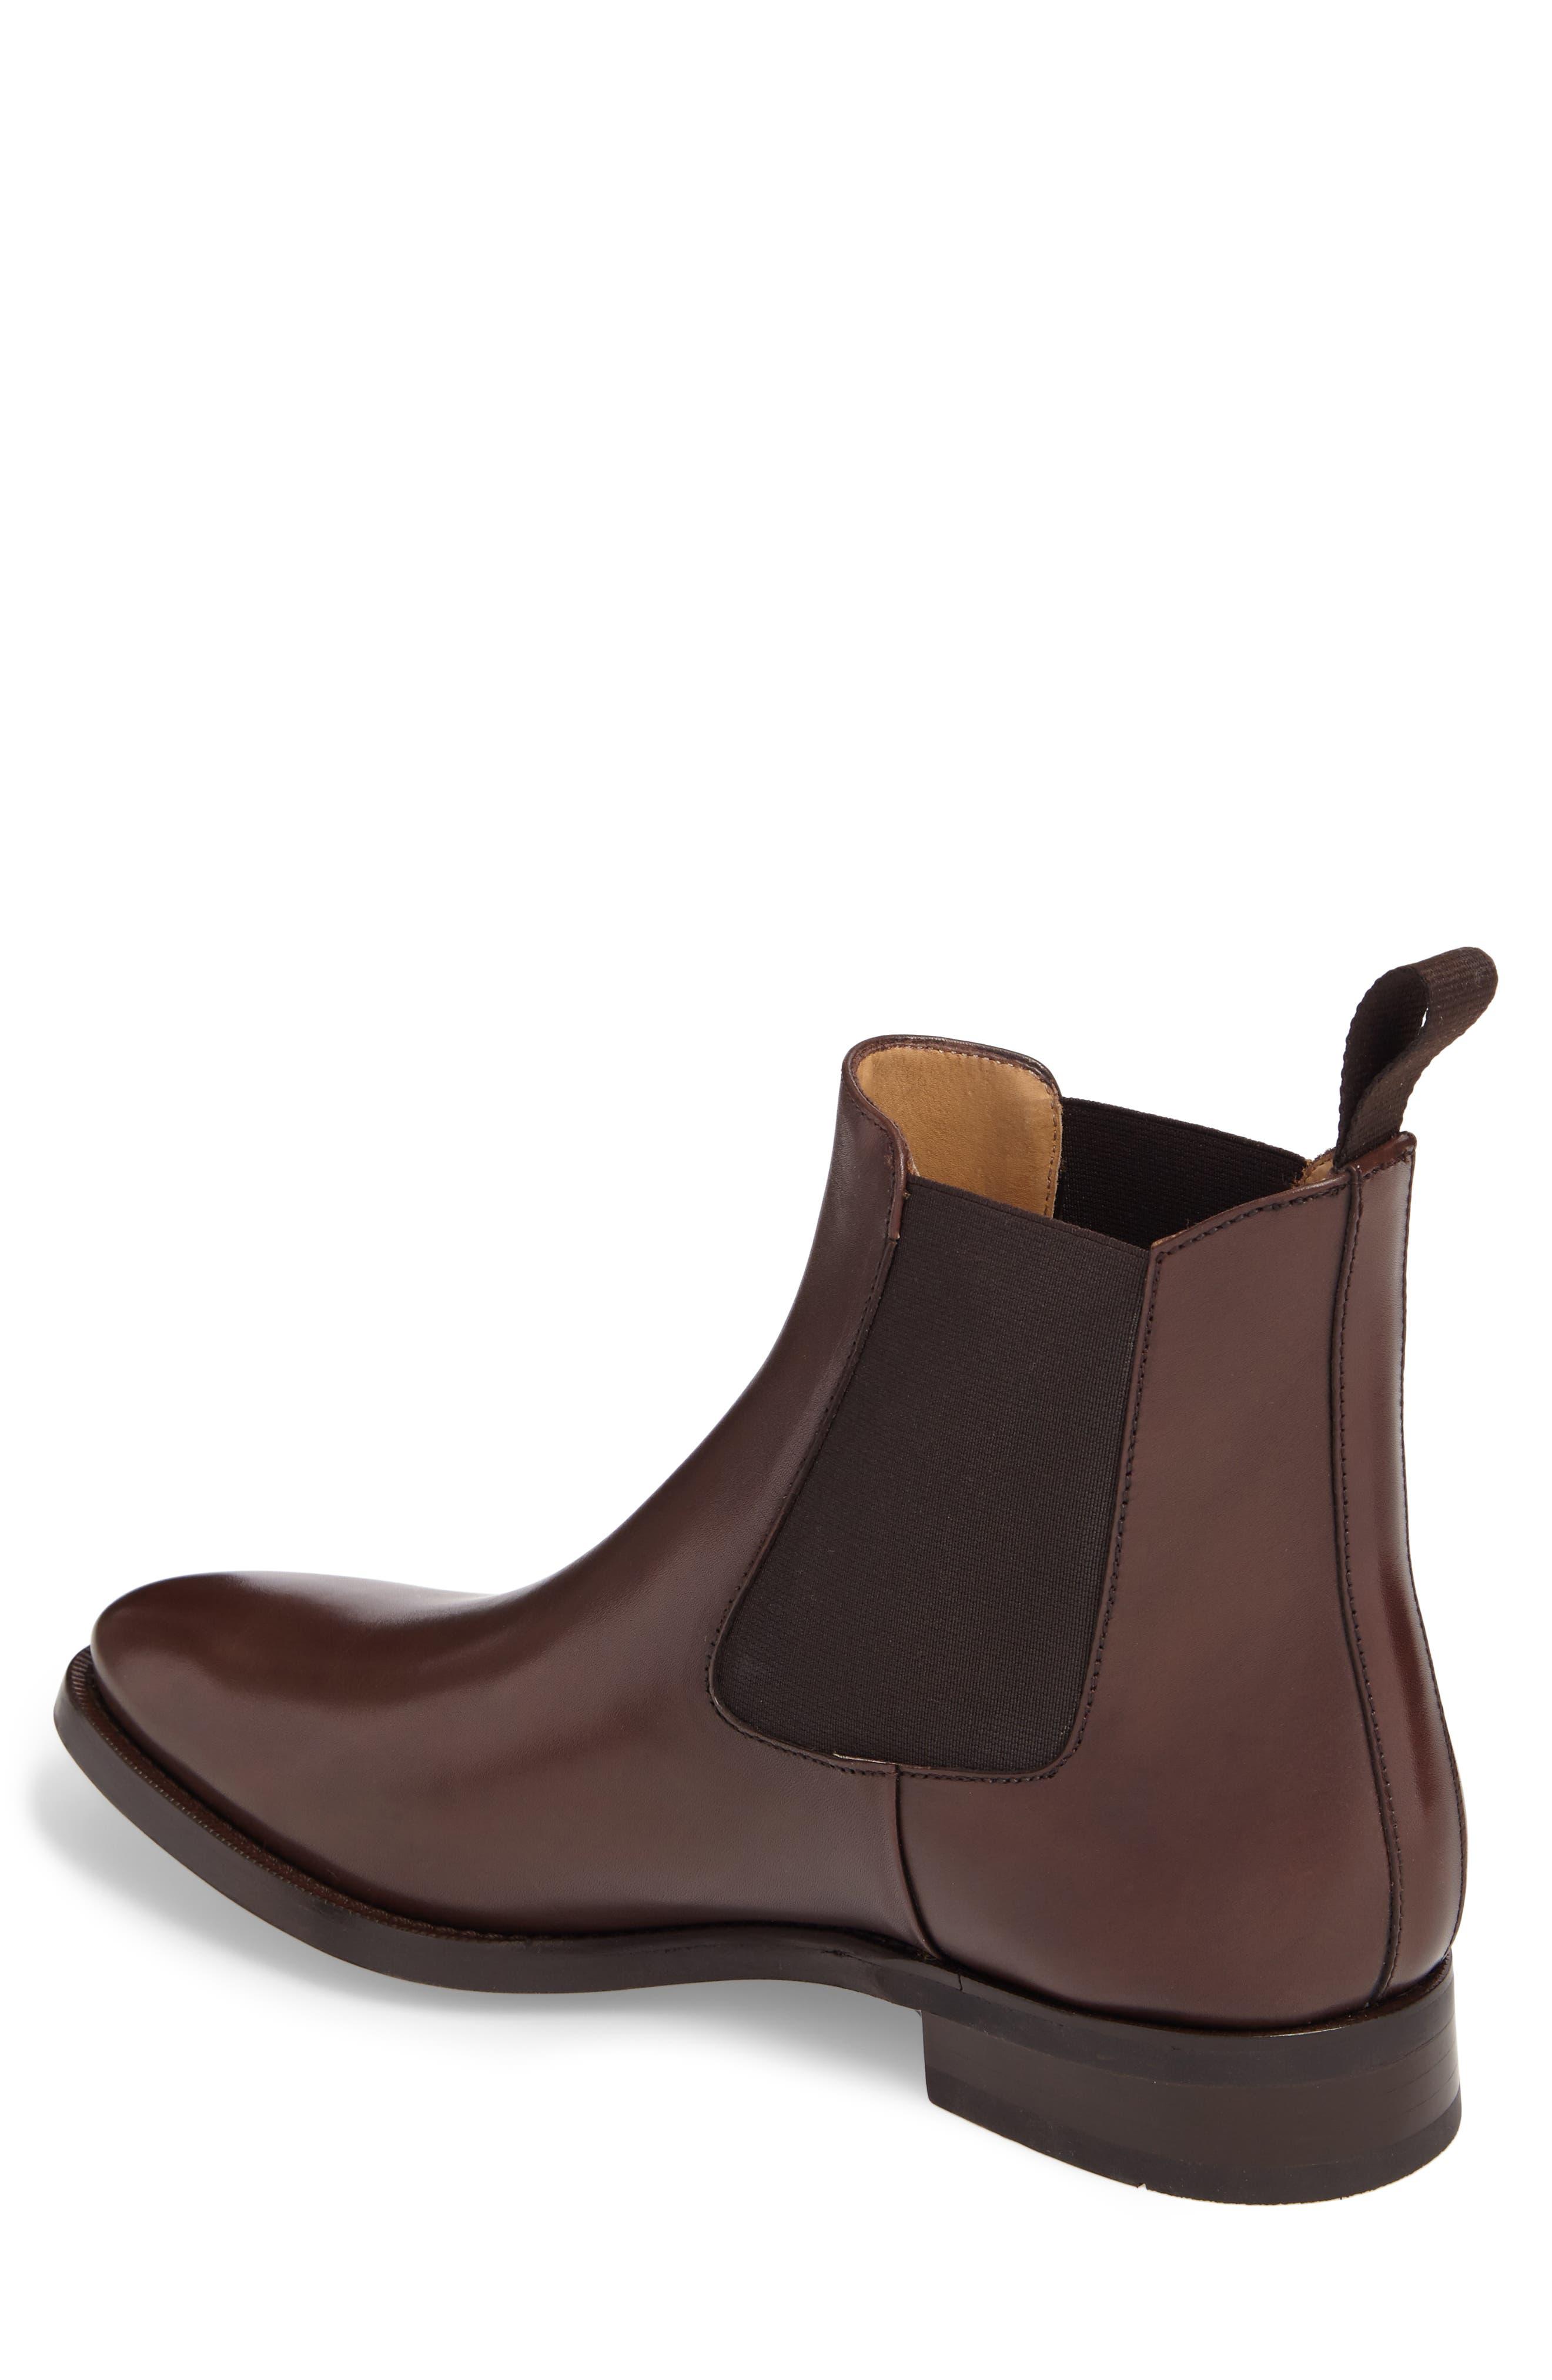 Ellis Water Resistant Chelsea Boot,                             Alternate thumbnail 4, color,